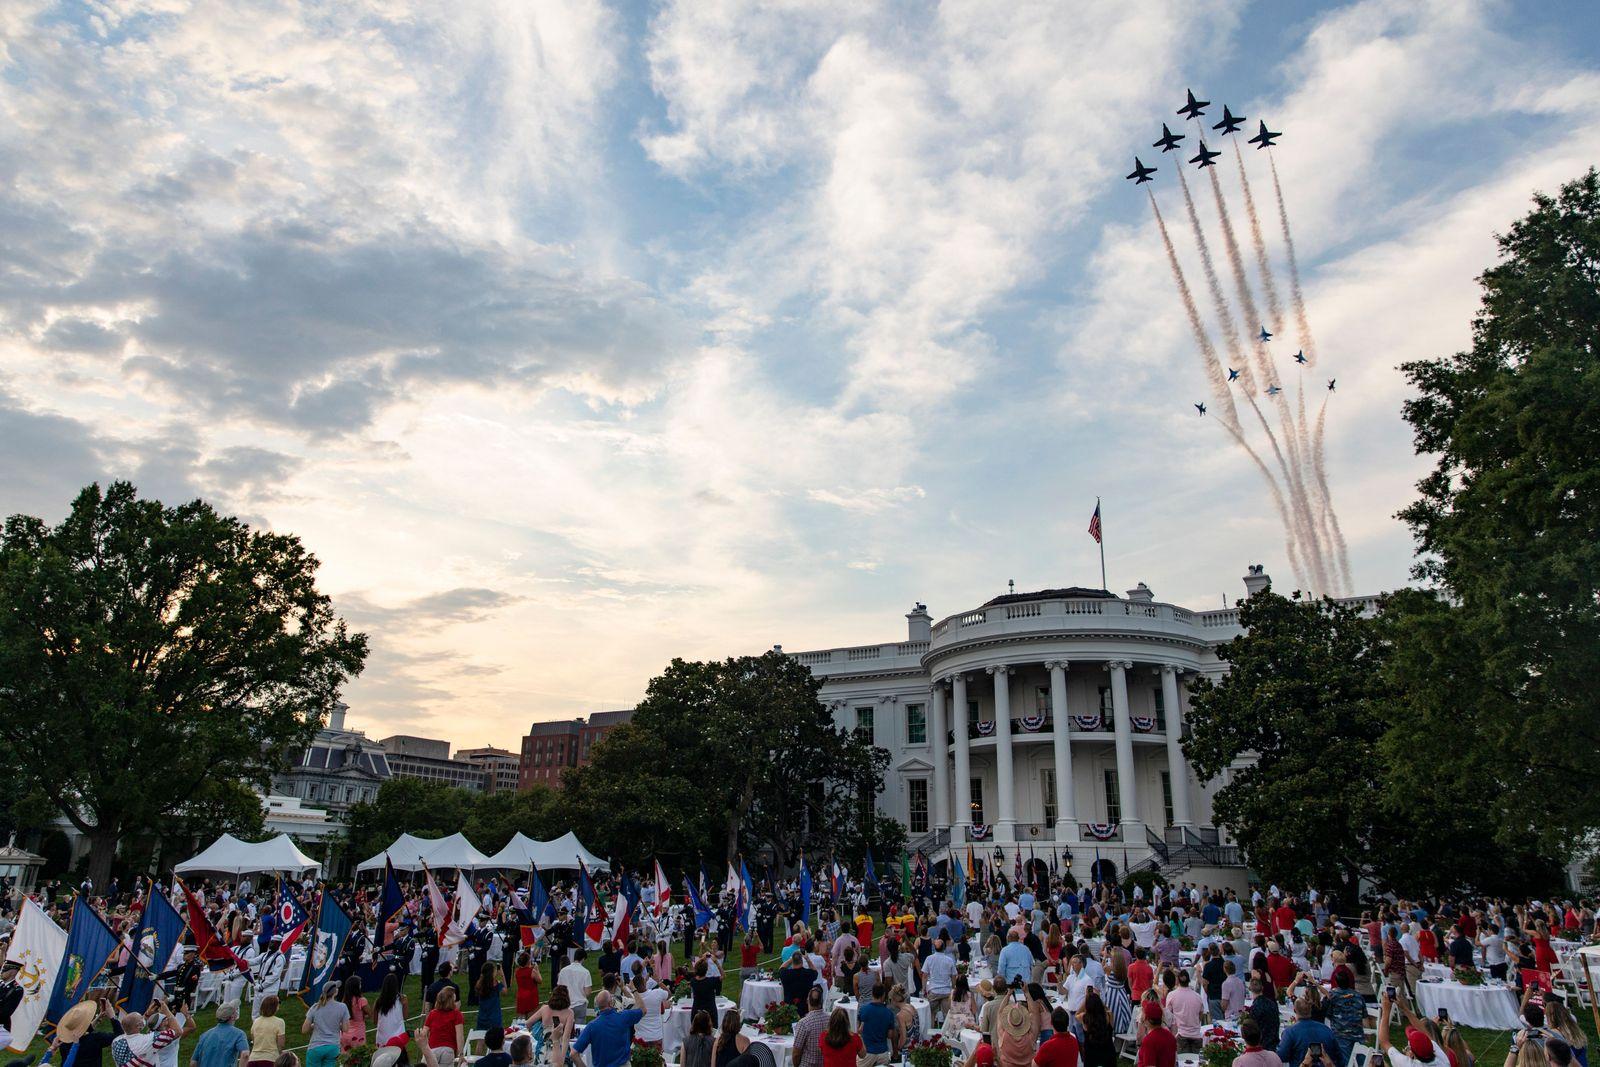 The 2020 Salute to America celebration at the White House, Washington, USA - 04 Jul 2020